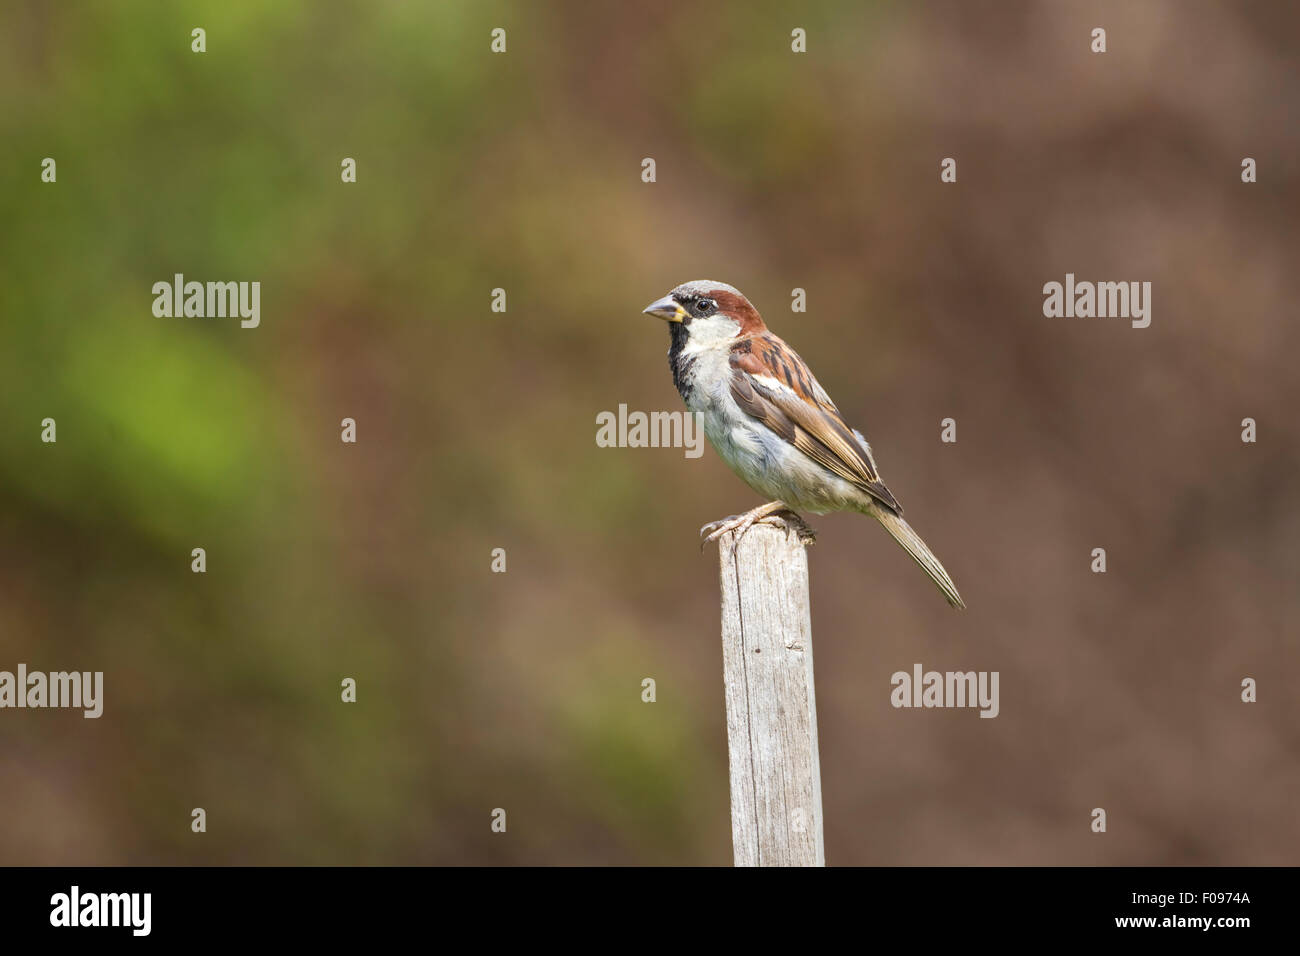 Passer domesticus Gorrión macho posado sobre un poste de cerca con fondo difuso Foto de stock